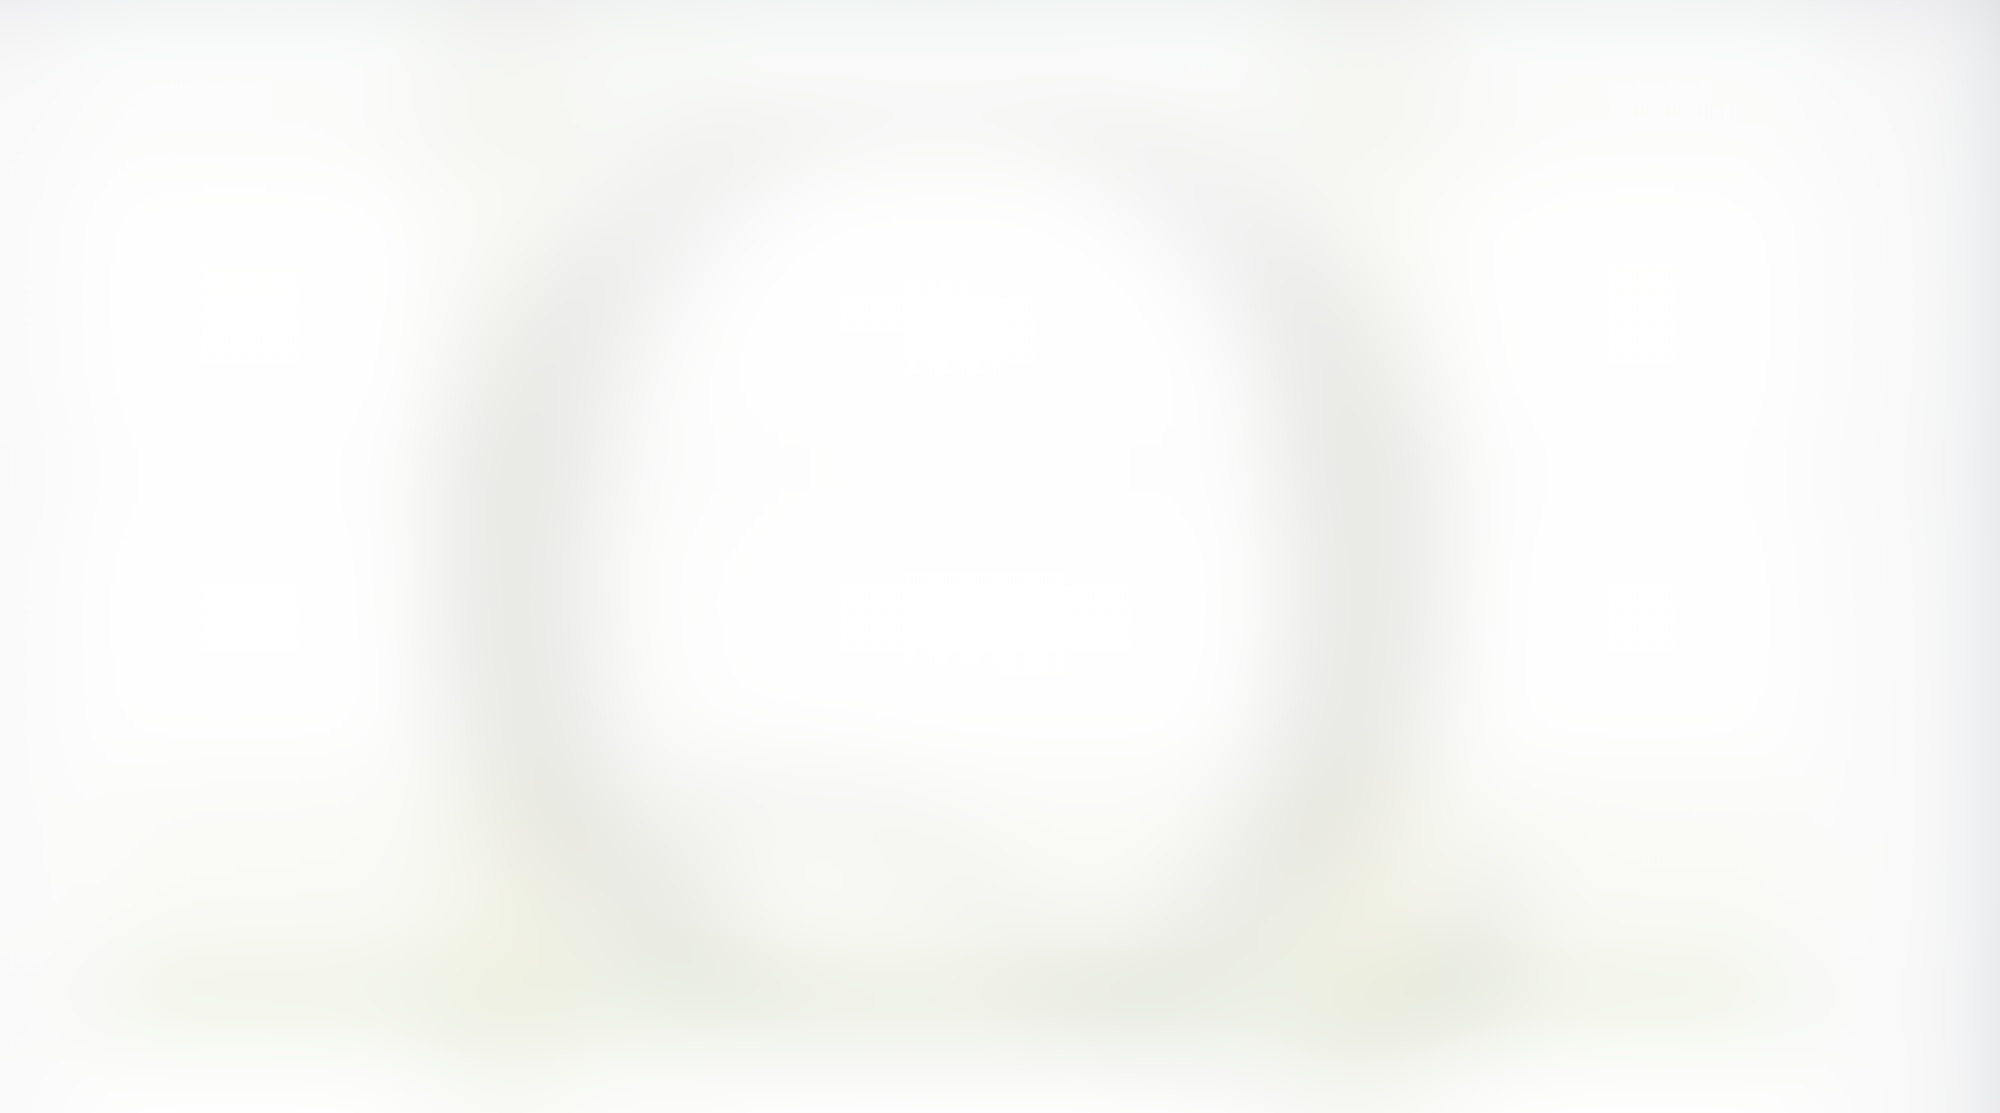 Sawdust x quainton fontlab 3 autocompressfitresizeixlibphp 1 1 0max h2000max w3 D2000q80s918e62af81b7788fde27adaf2b0c94b7